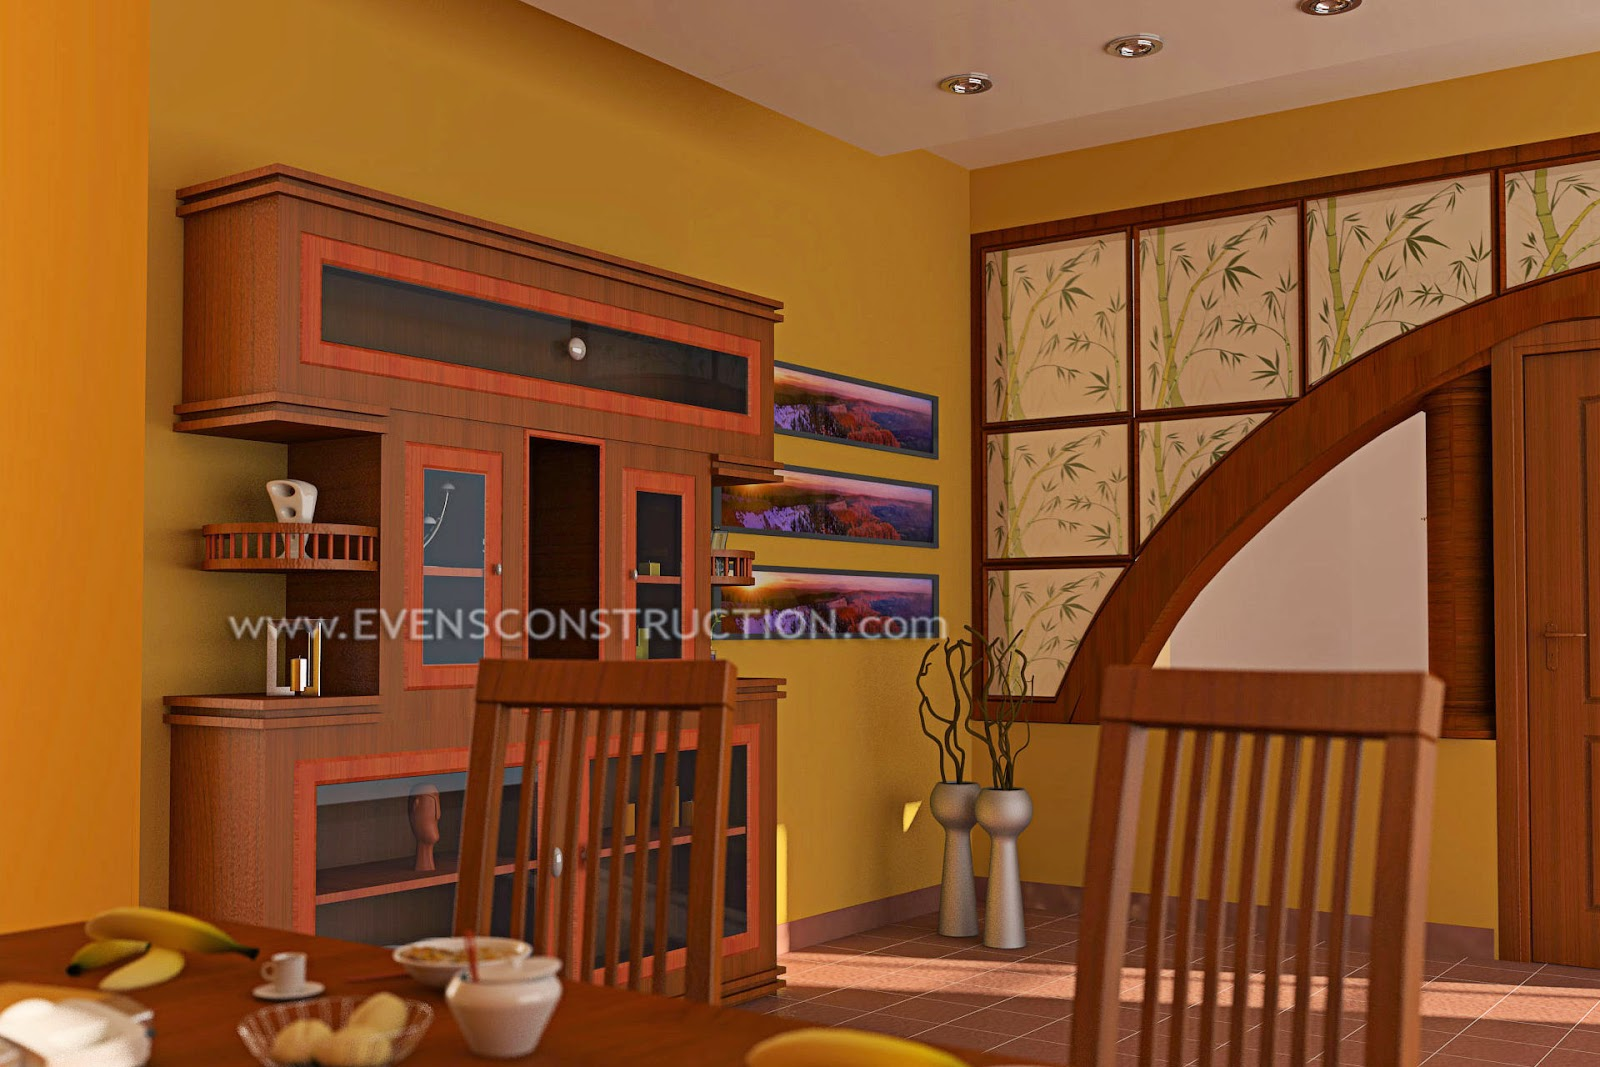 Dining Room With Crockery Shelf